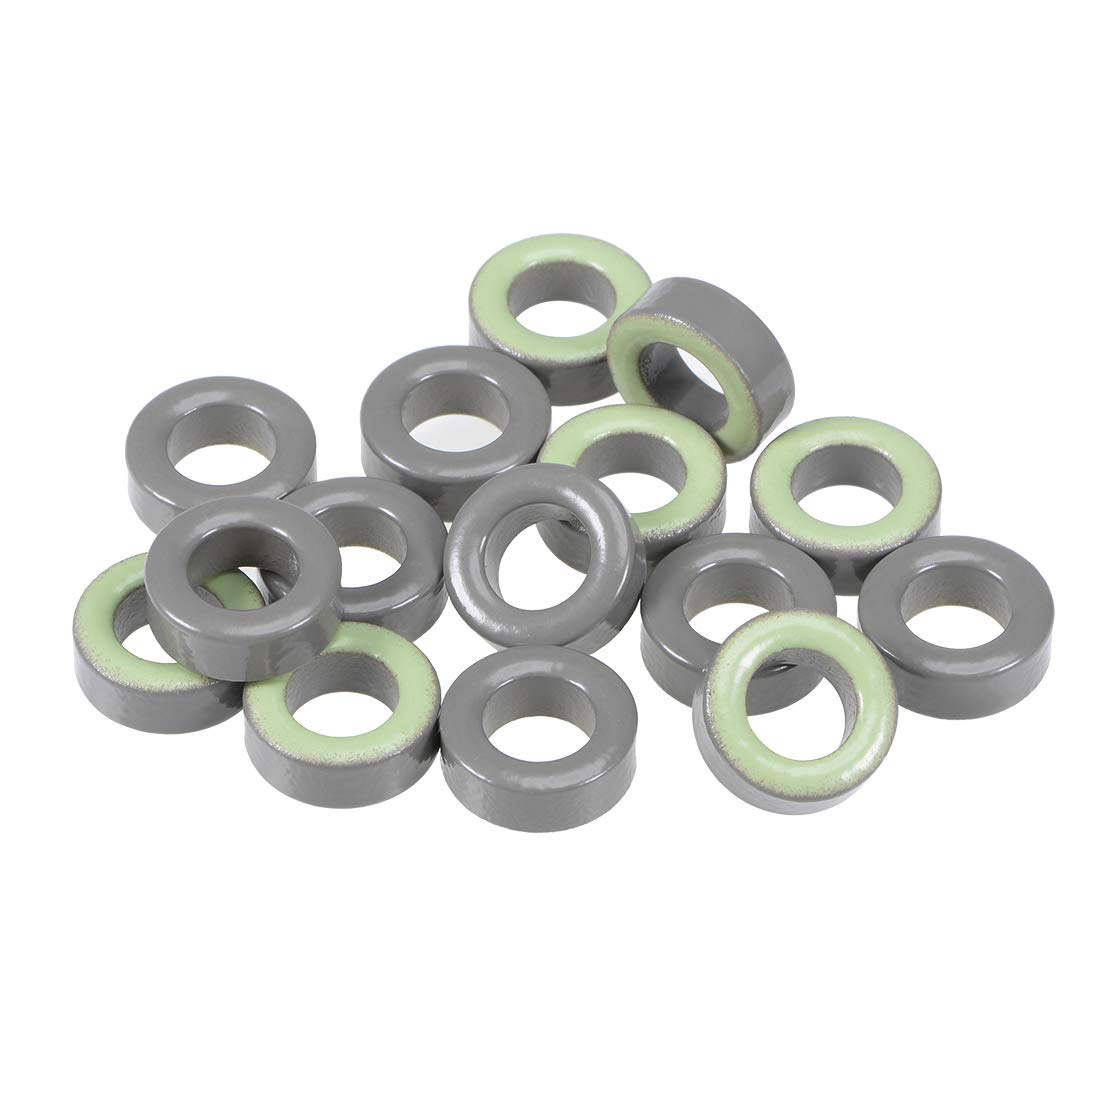 uxcell 15pcs 7.4 x 13.3 x 5mm Ferrite Ring Iron Powder Toroid Cores Gray Light Green